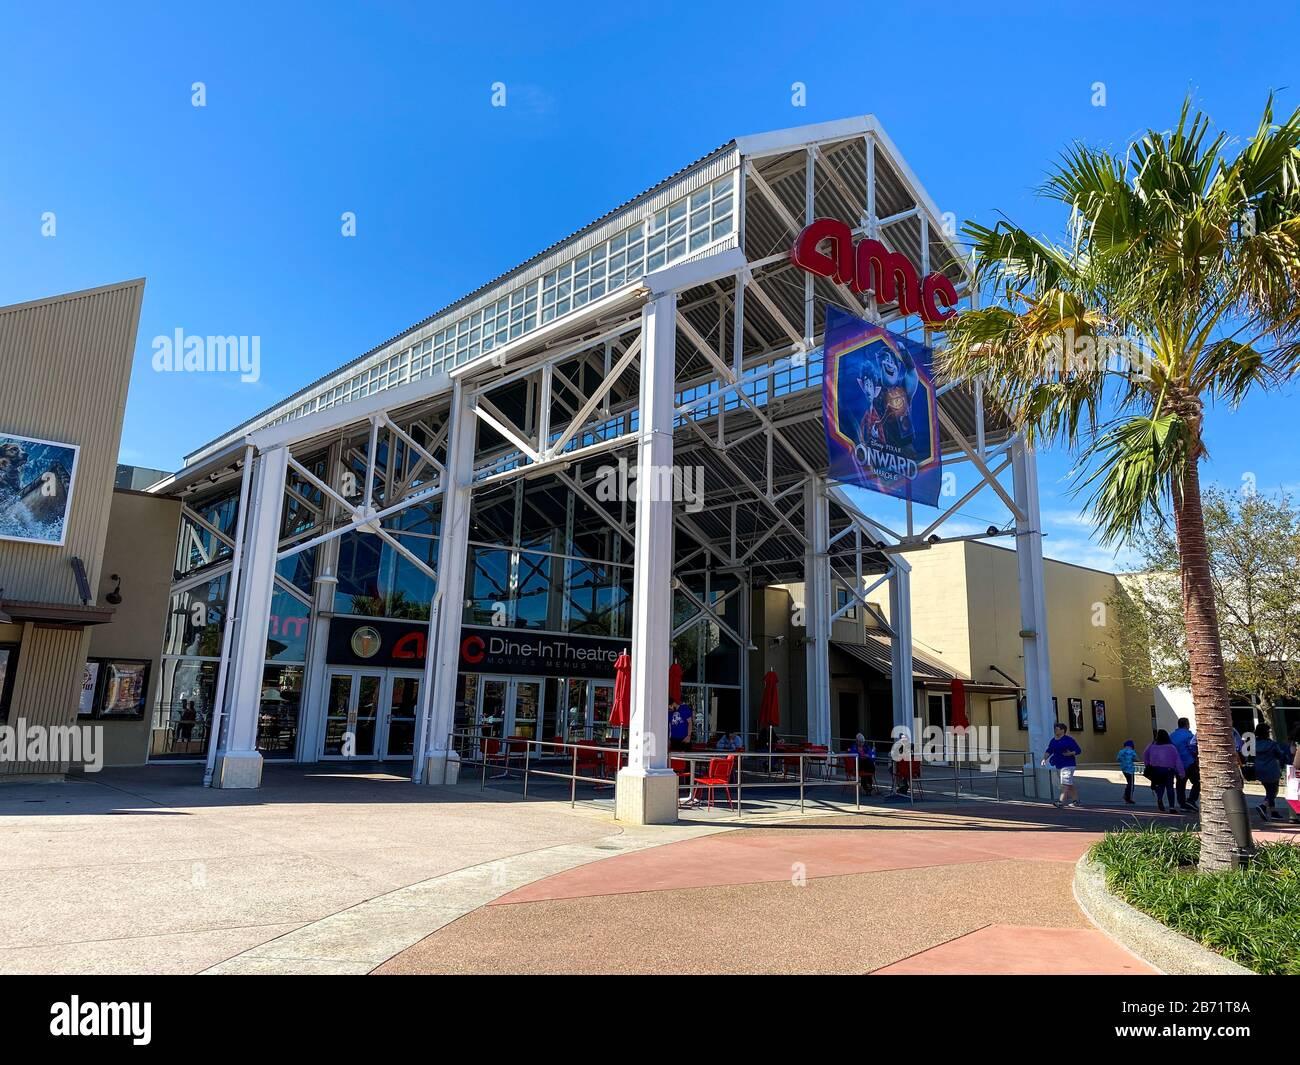 Orlando, FL/USA-2/29/20: An AMC Dine-In Theatre at an outdoor mall in Orlando, Florida. Stock Photo